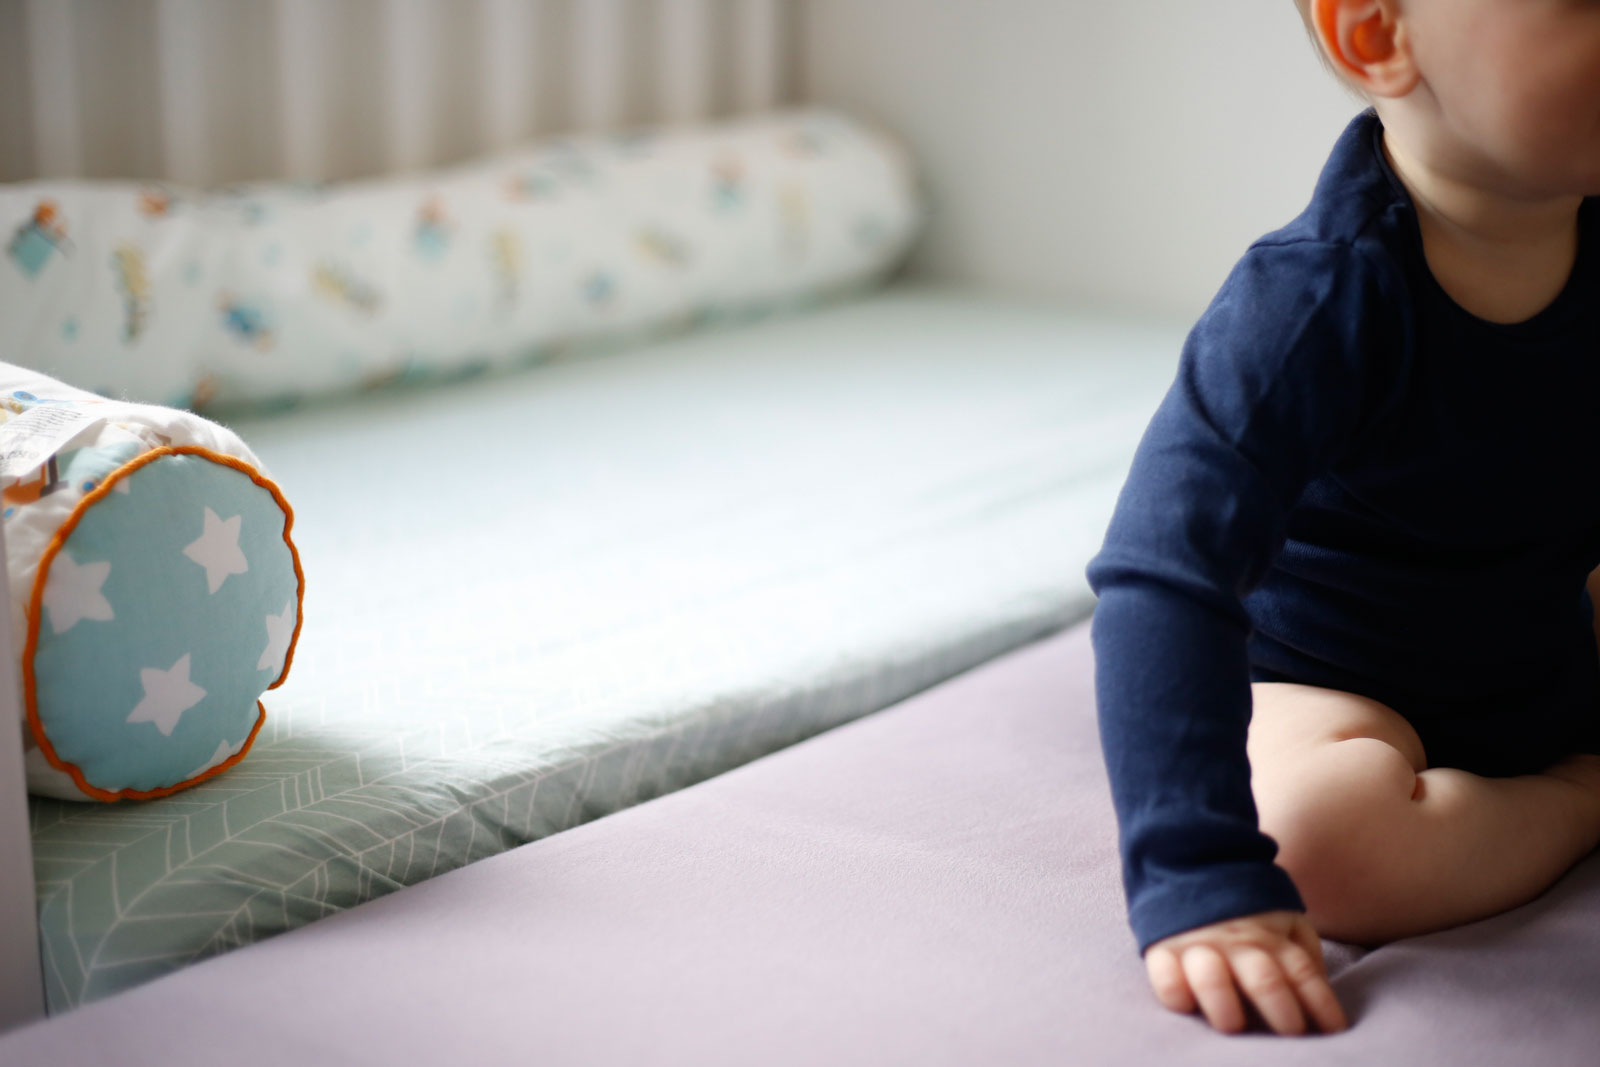 mein baby schl ft bei mir unser weg zum familienbett. Black Bedroom Furniture Sets. Home Design Ideas